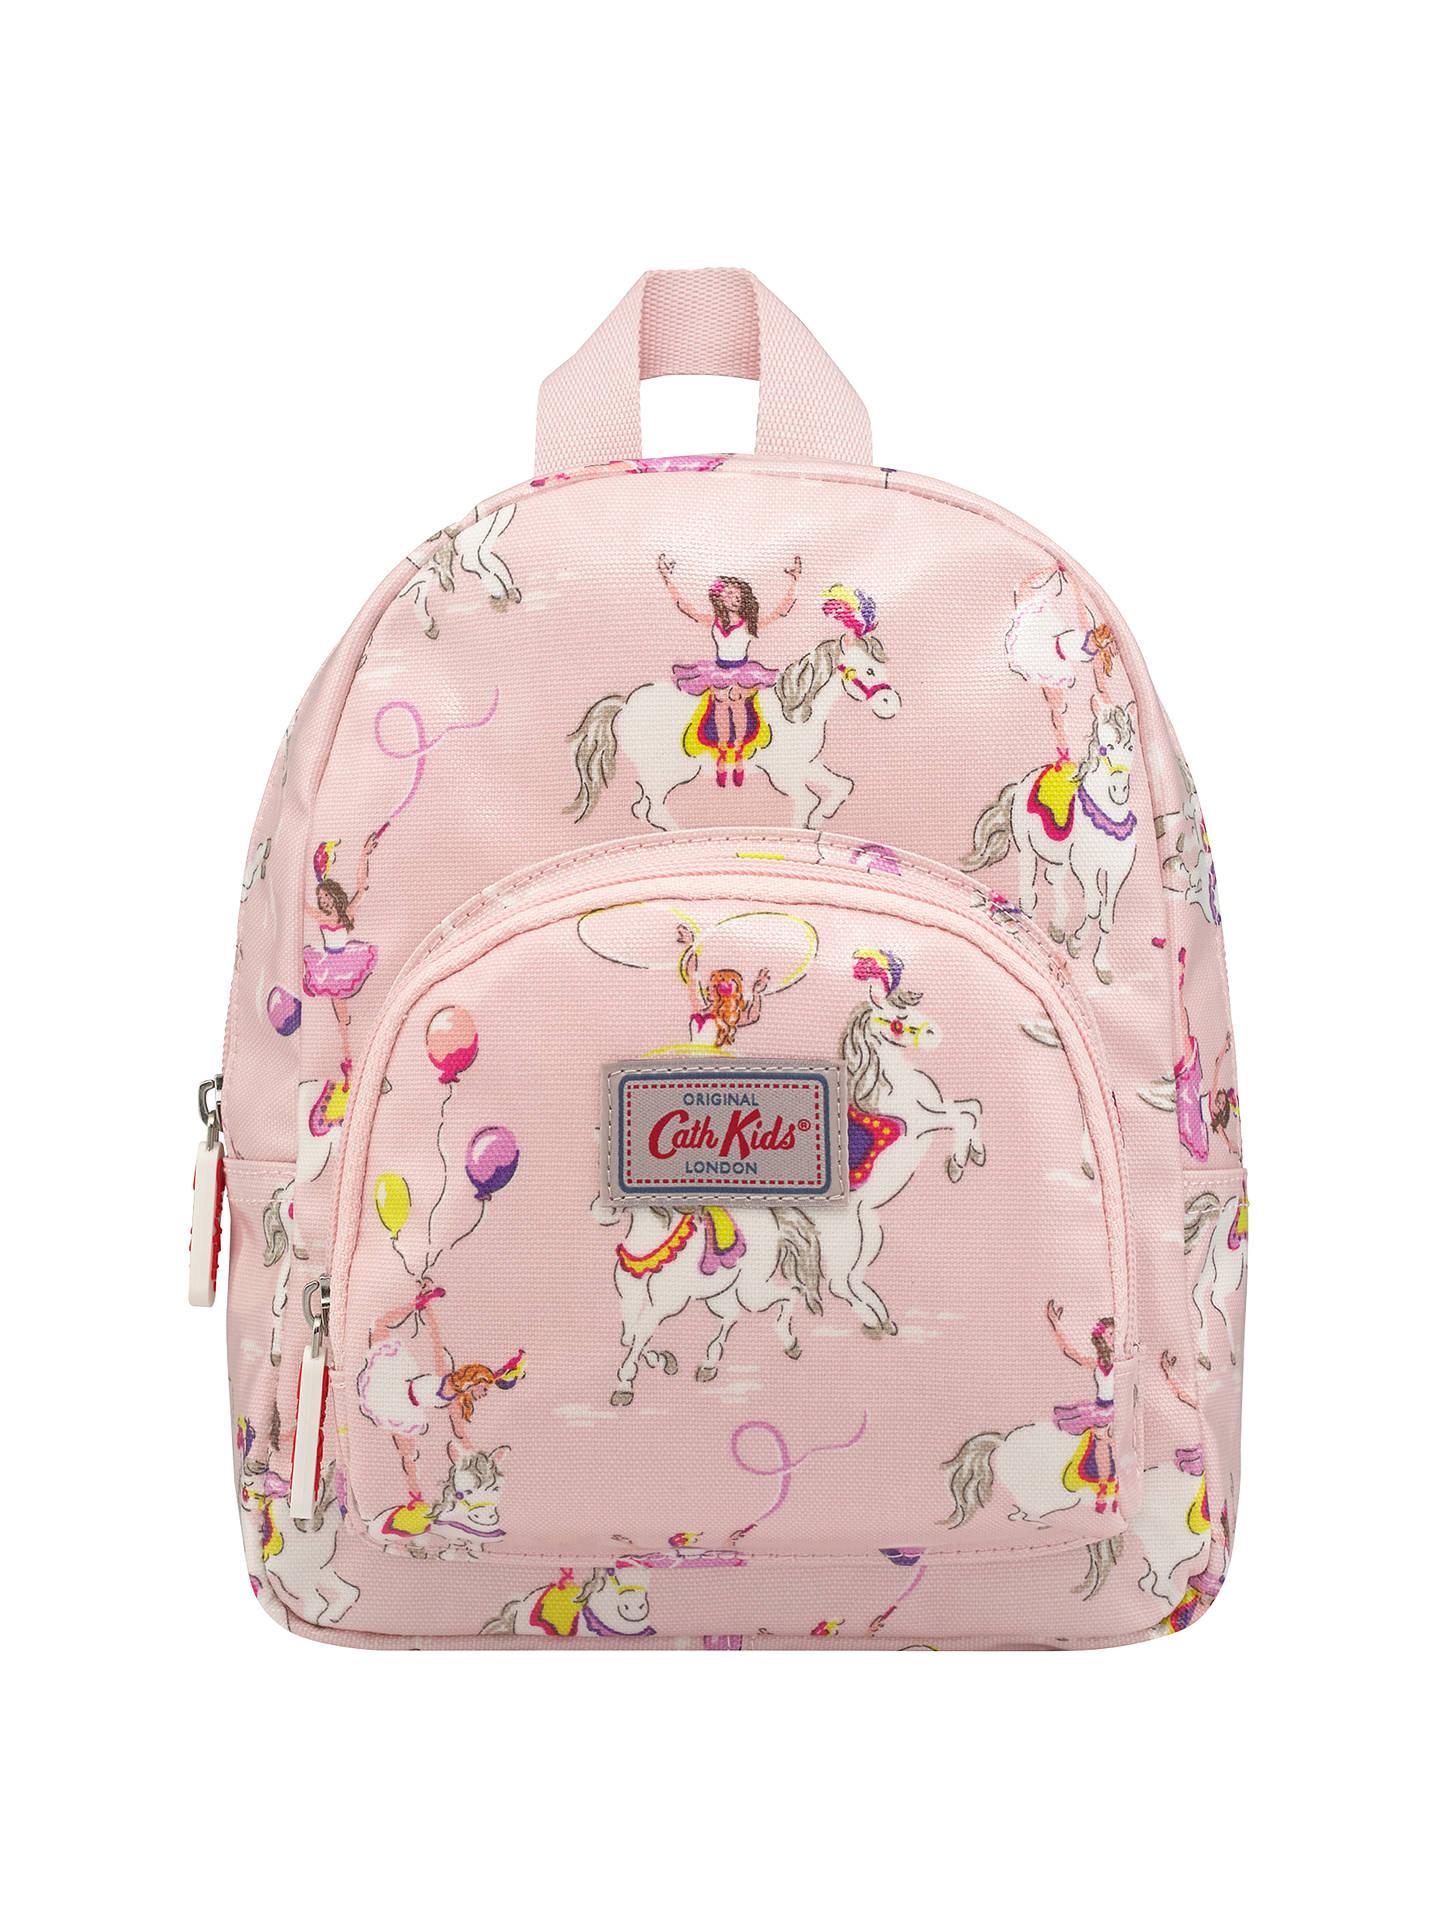 Cath Kidston Children S Prancing Ponies Mini Backpack Pink At John